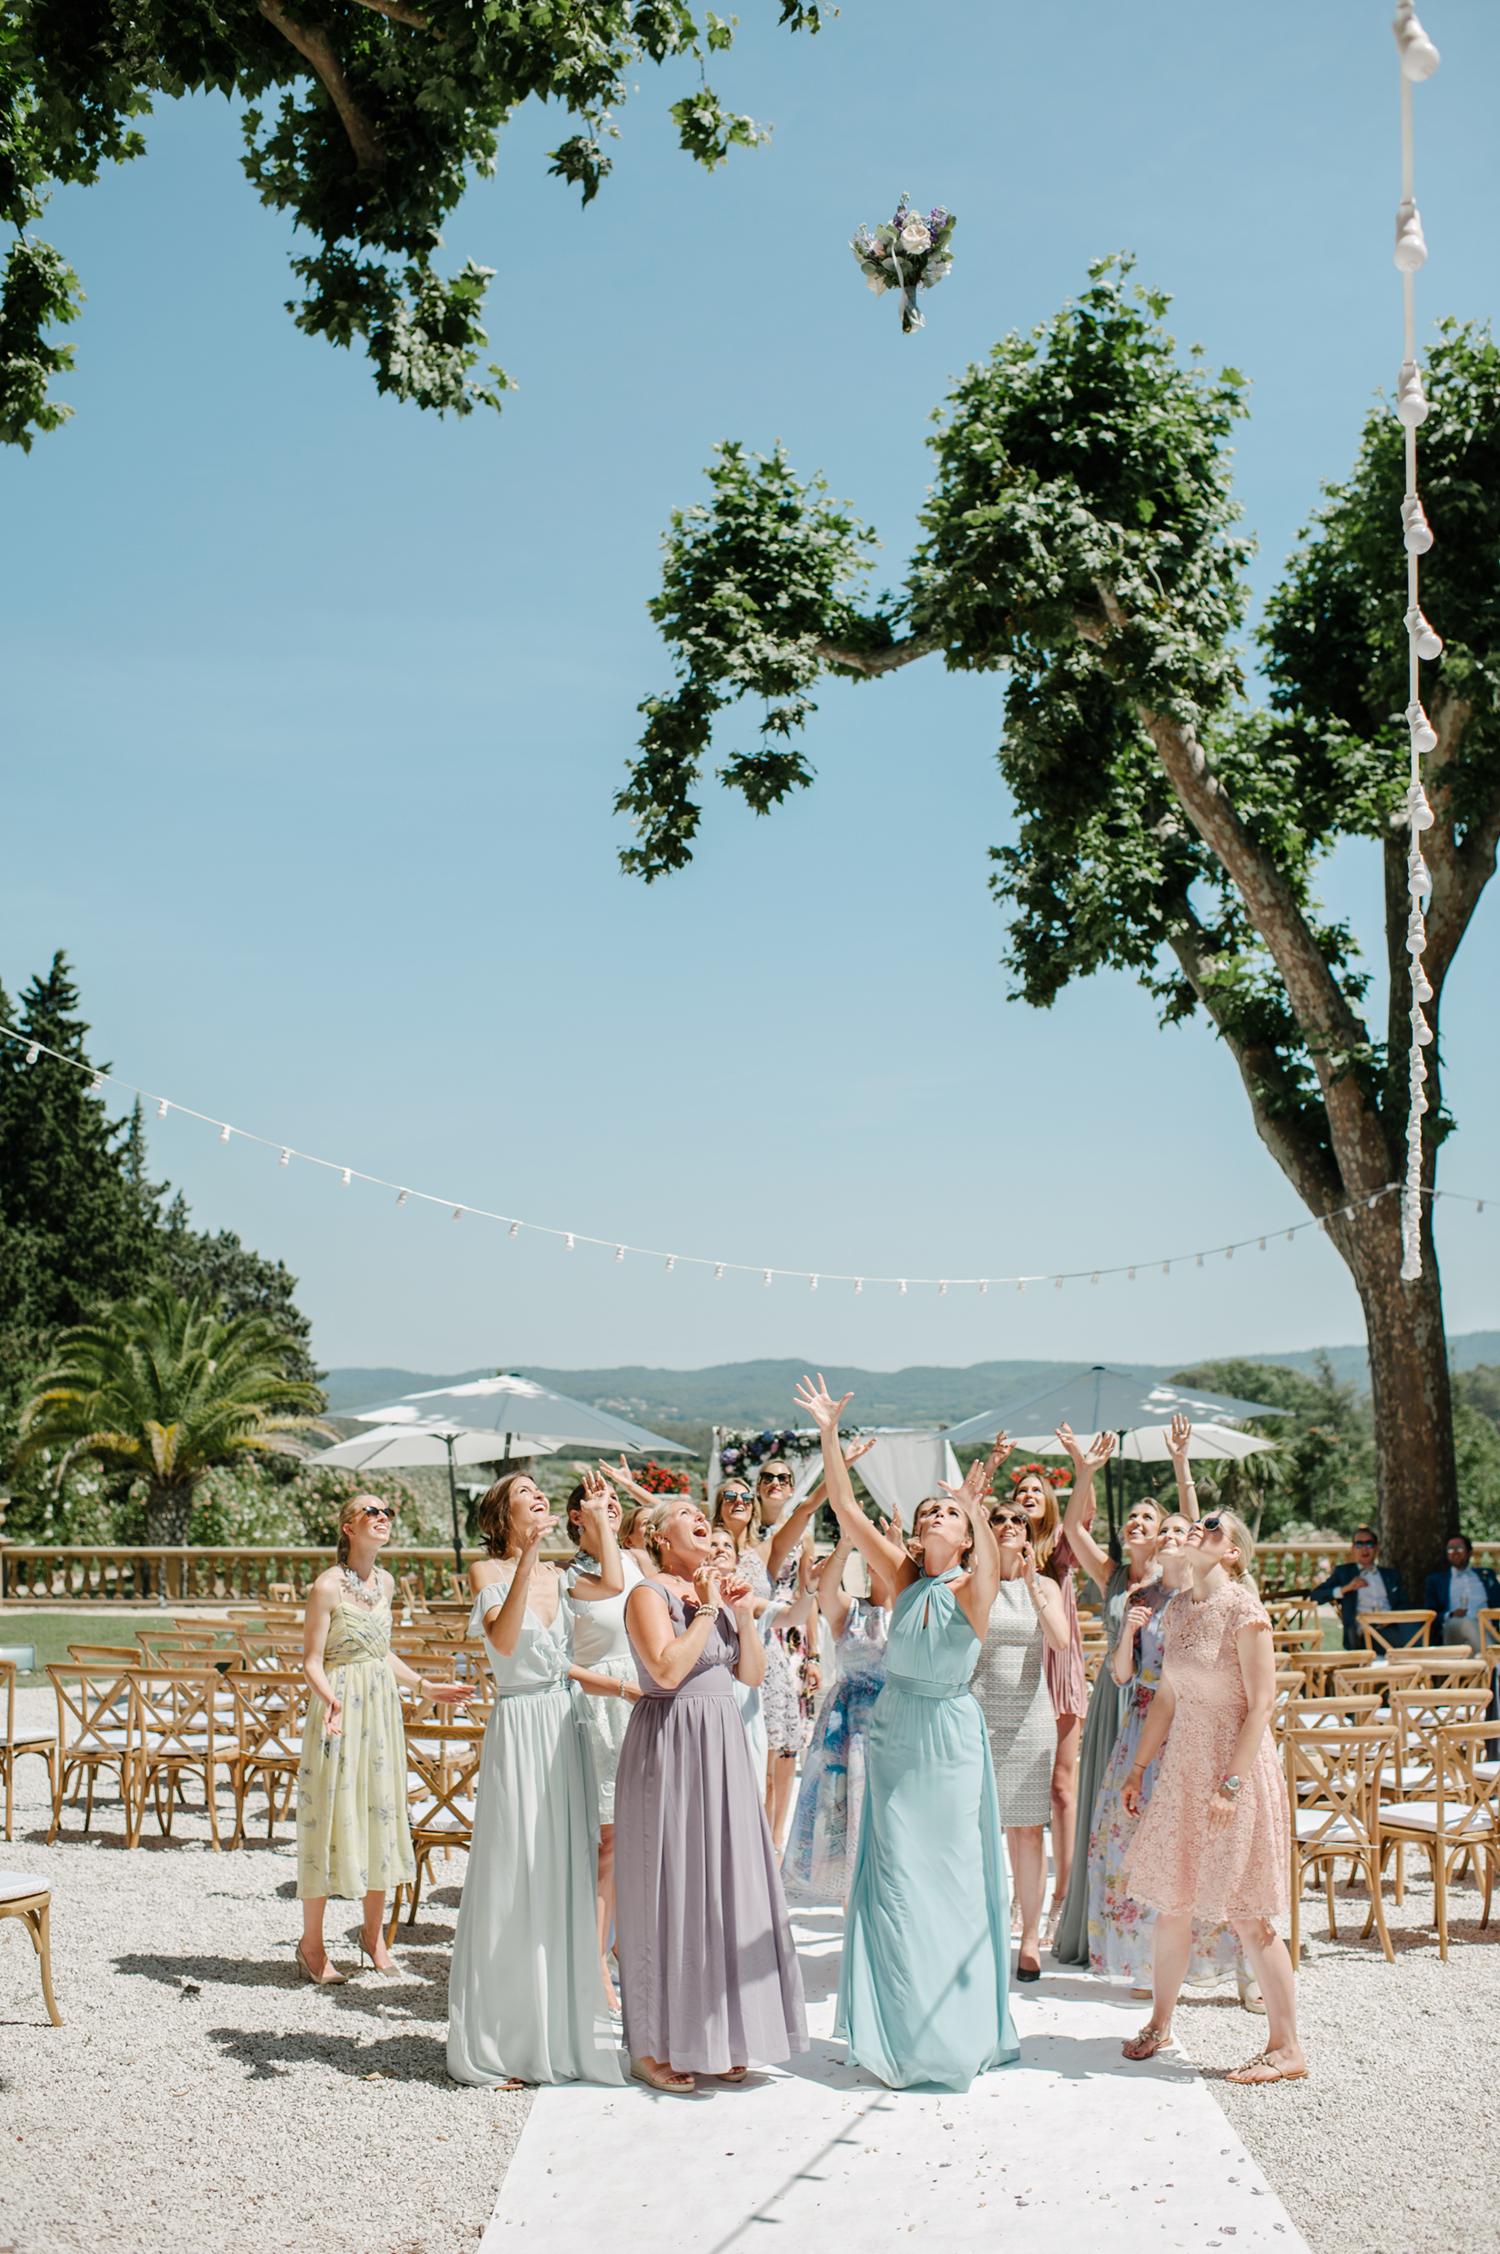 Chateau-Robernier-Wedding-Photographer-0095.jpg